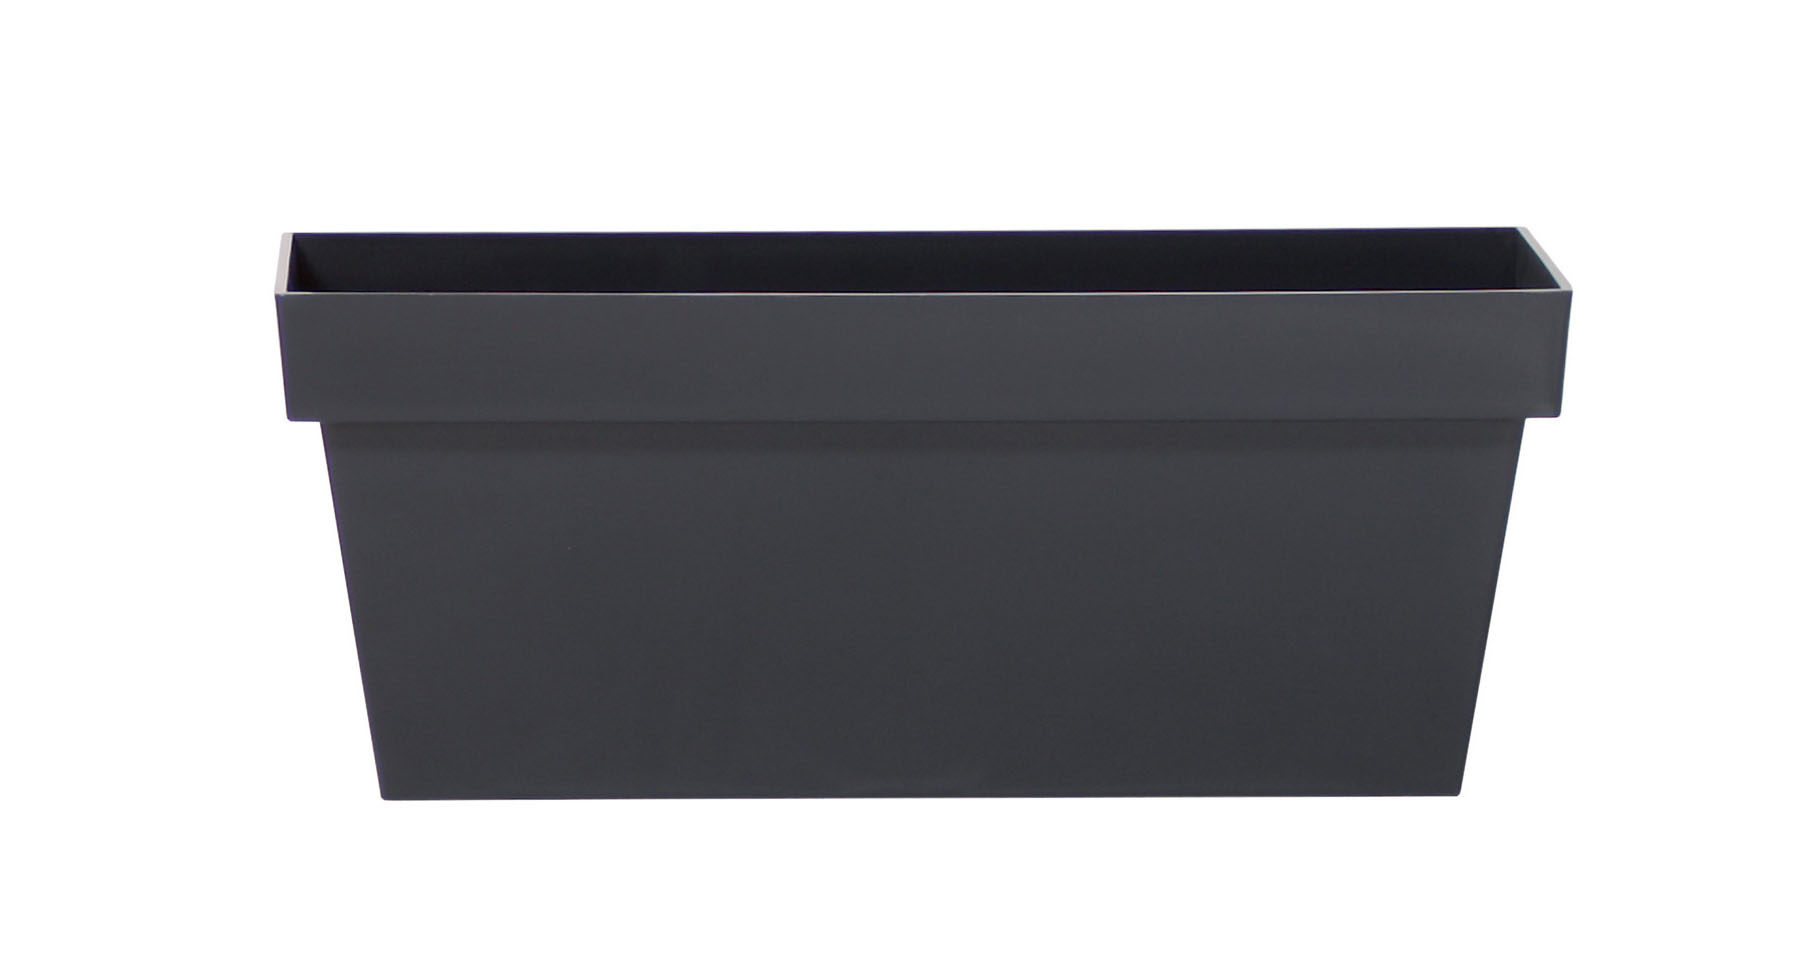 PROSPERPLAST Truhlík CUBE CASE antracit 58,7cm